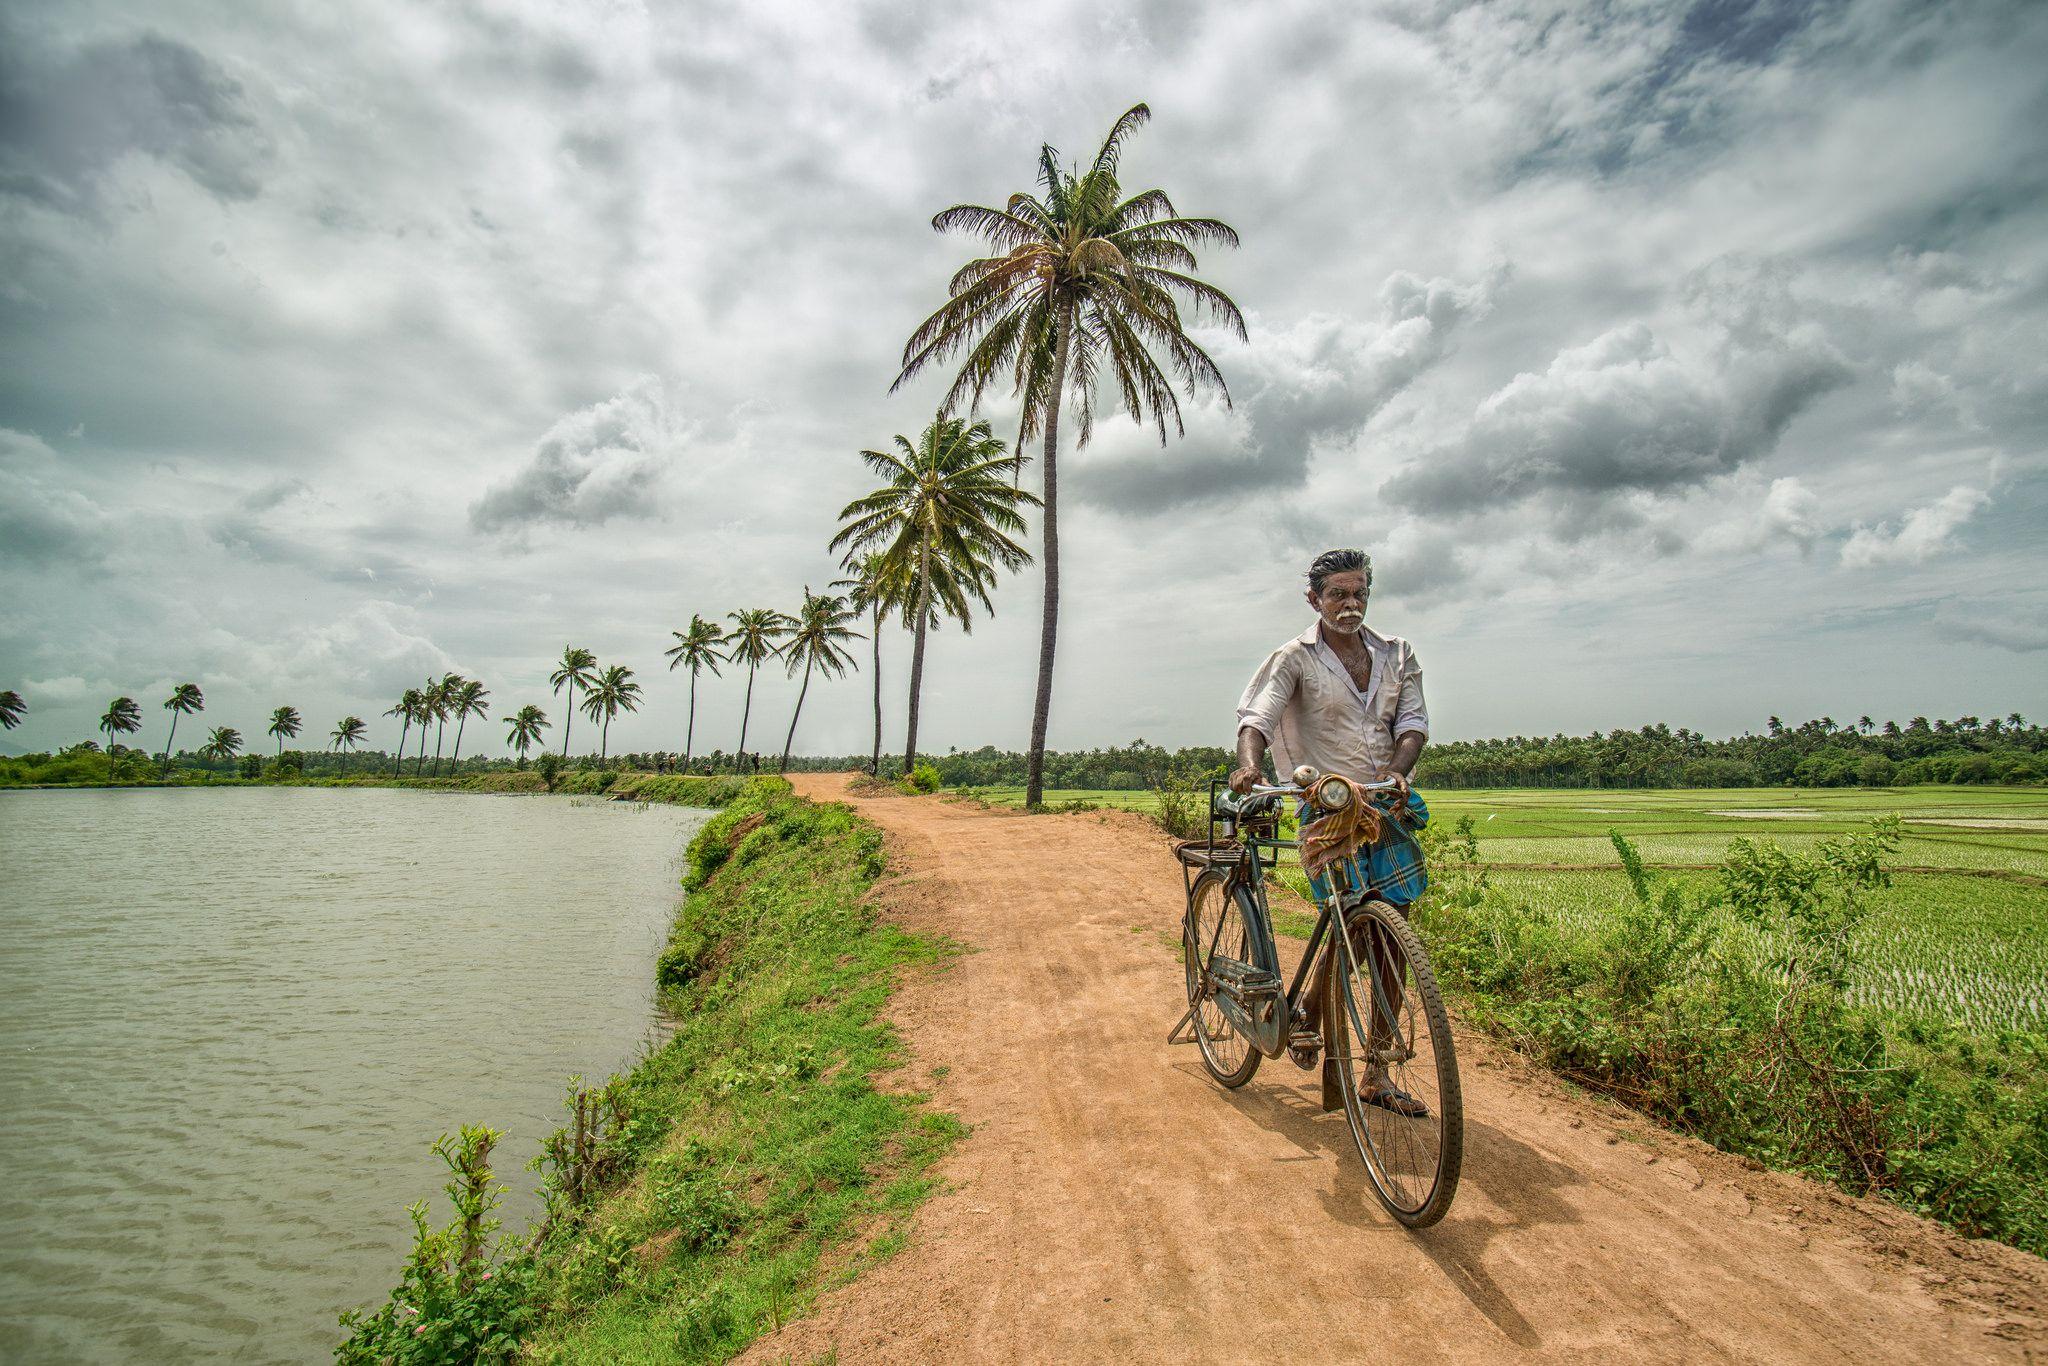 Tamilnadu village images